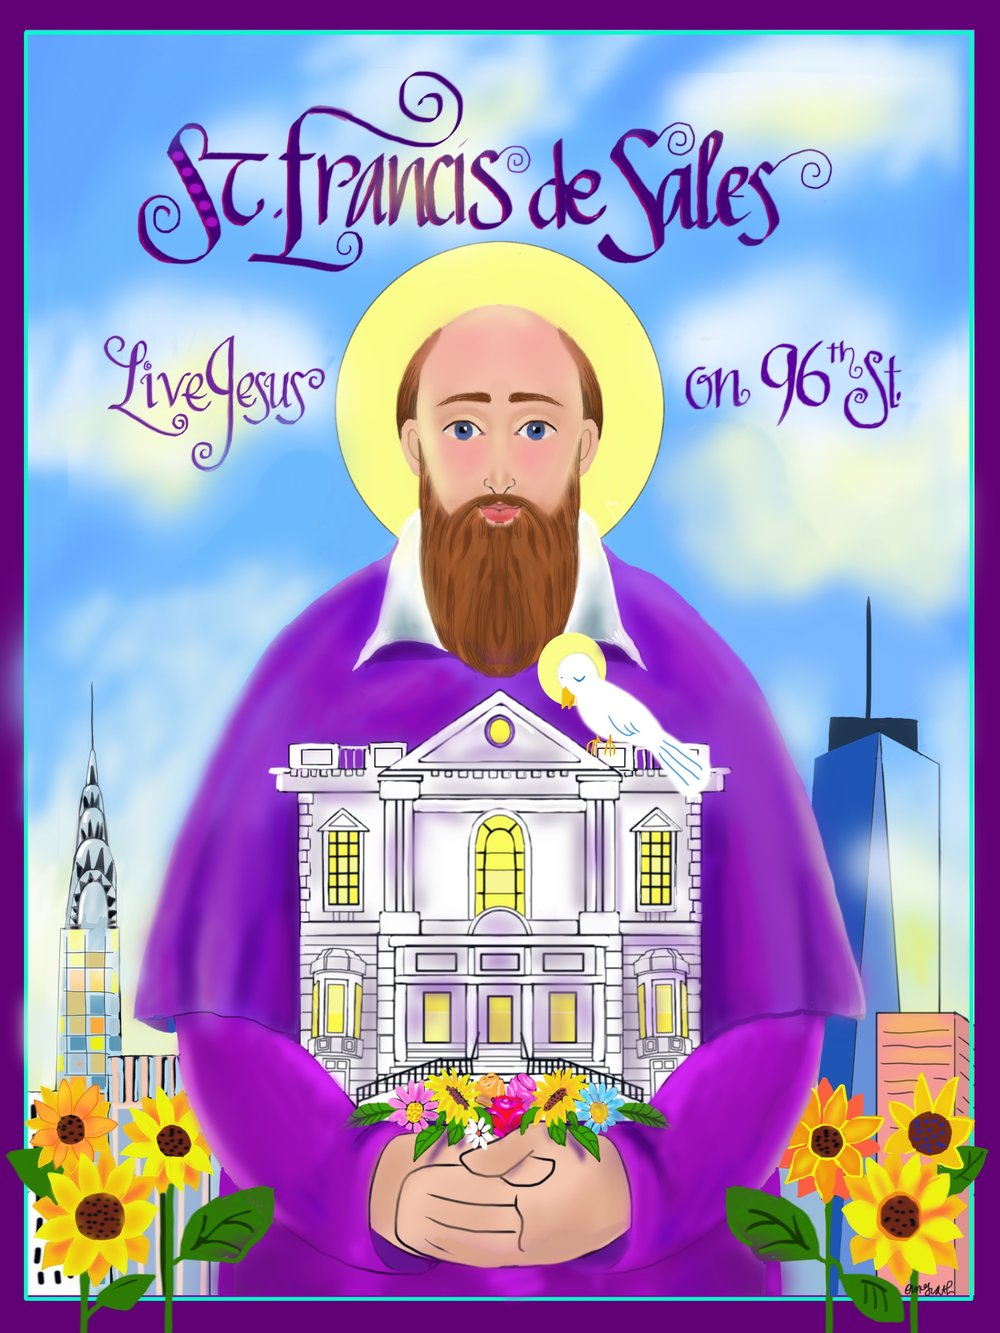 original-saint-francis-brother-mickey-mcgrath-st-francis-de-sales-catholic-church-new-york.jpg